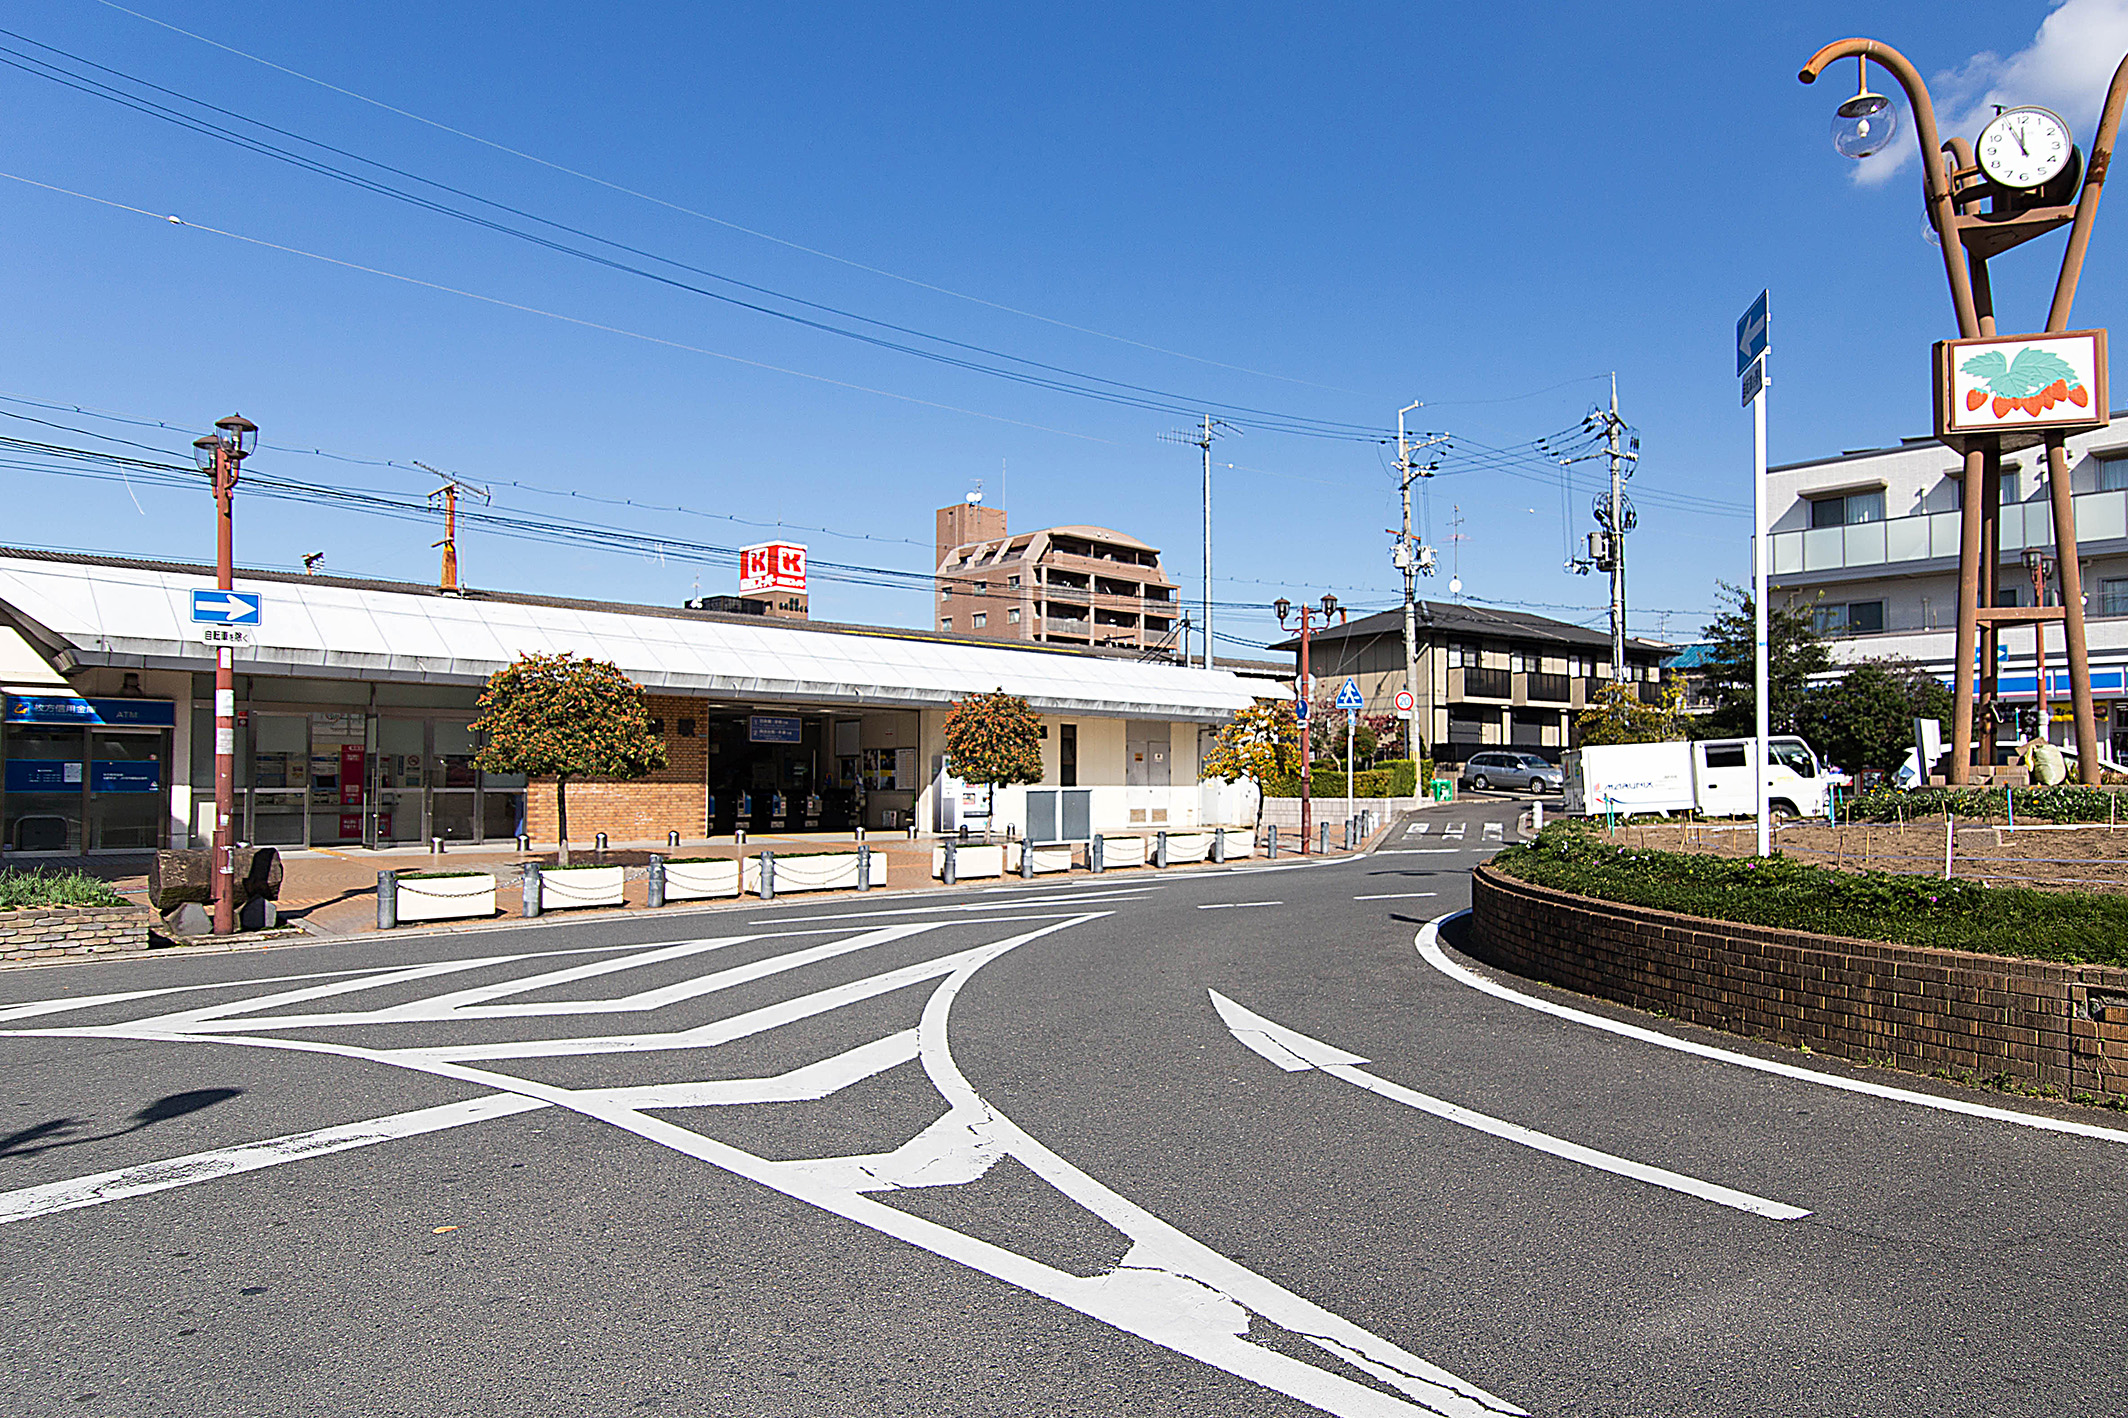 JR学研都市線「河内磐船」駅へ徒歩5分。快速停車駅なので乗り換えなしで「京橋」駅へ乗車25分。※快速を利用の場合。